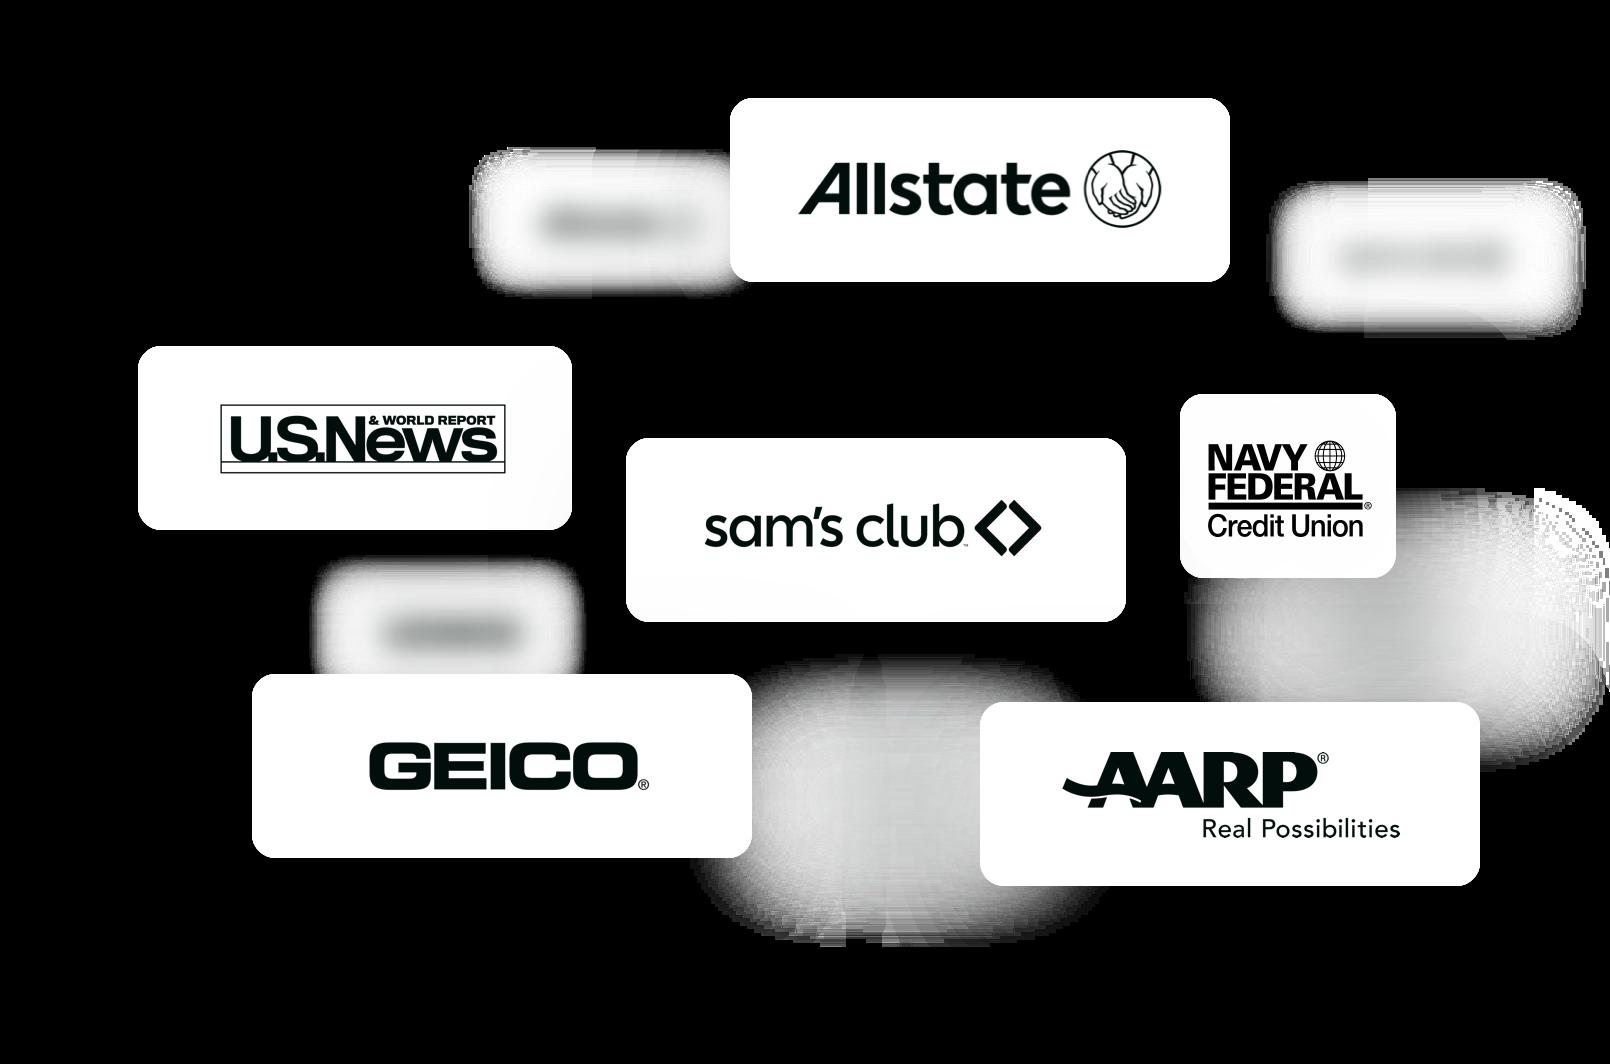 Floating Boxes of Affinity Partner Networks